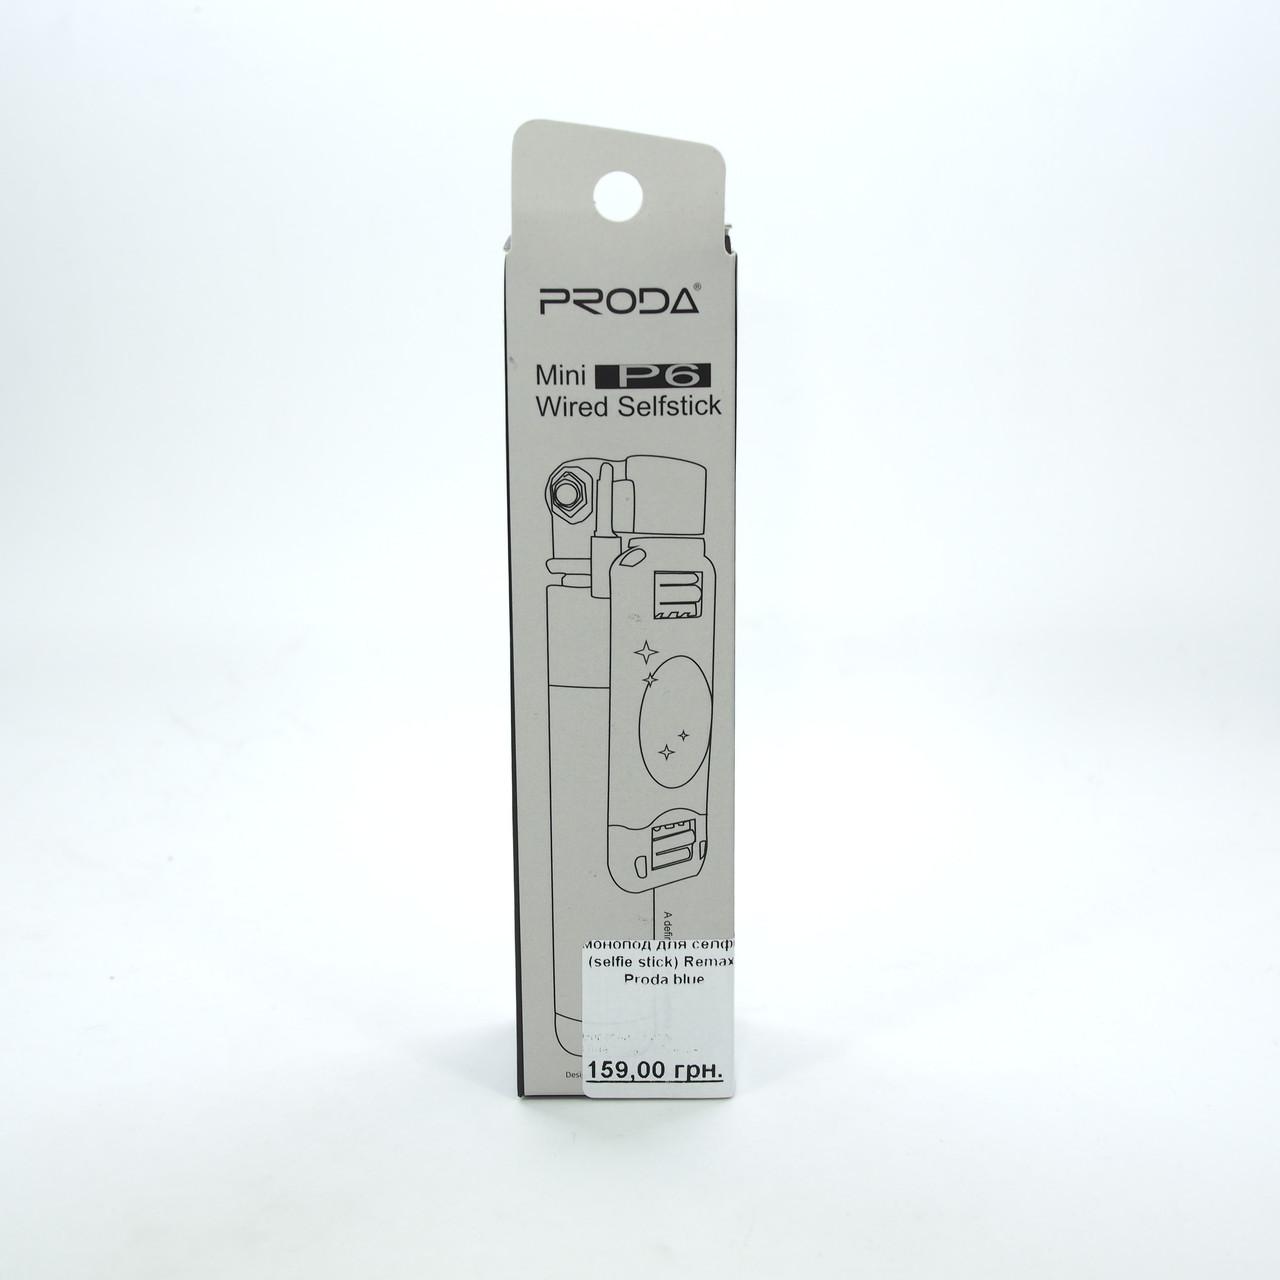 Remax Proda blue Монопод для селфи смартфона Дротове